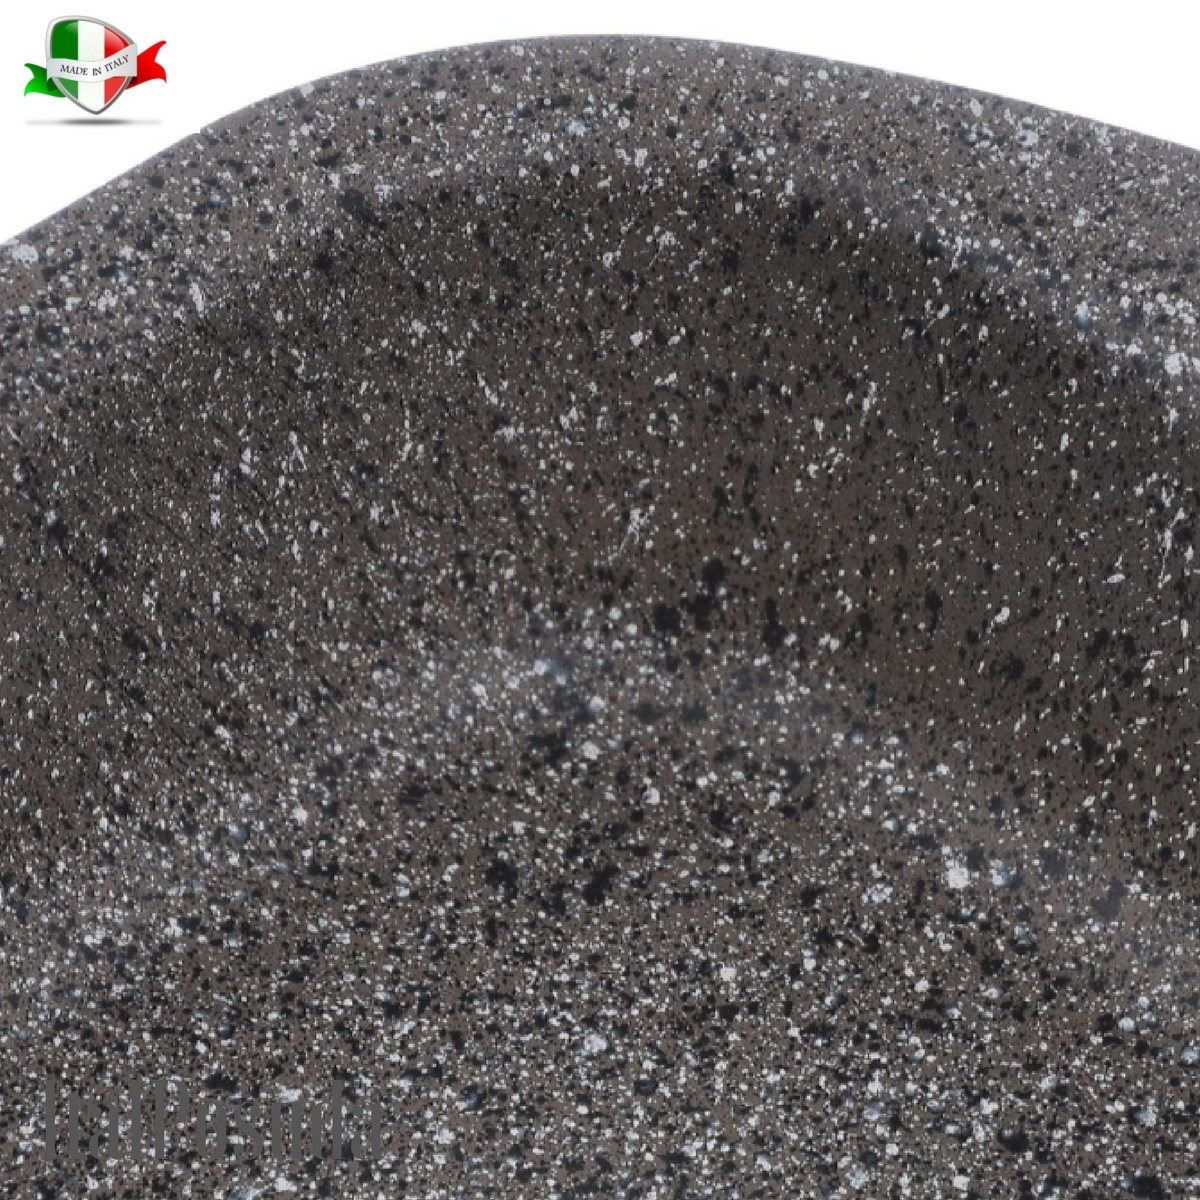 Противень Art Granit 25х18 см, высота 55мм